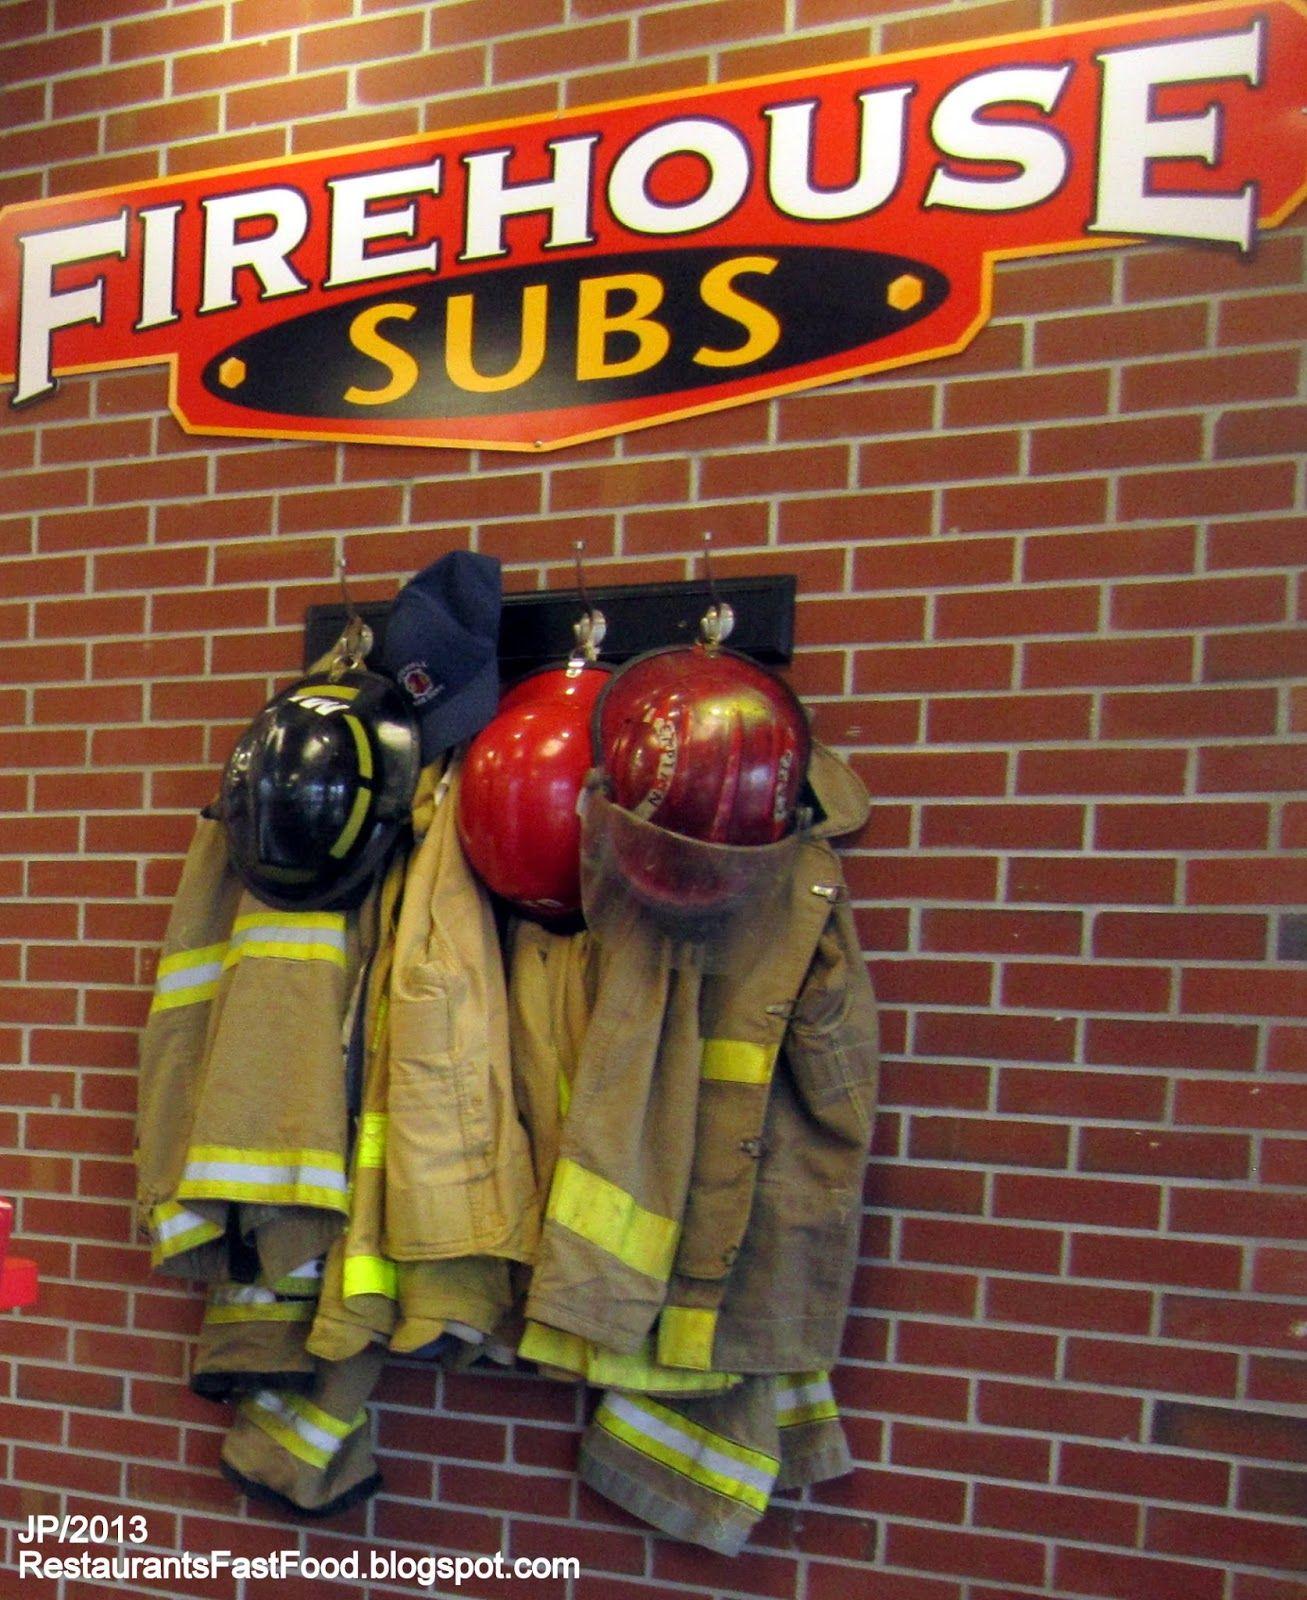 Firehouse Subs Restaurant Tifton Ga Firehouse Subs Milledgeville